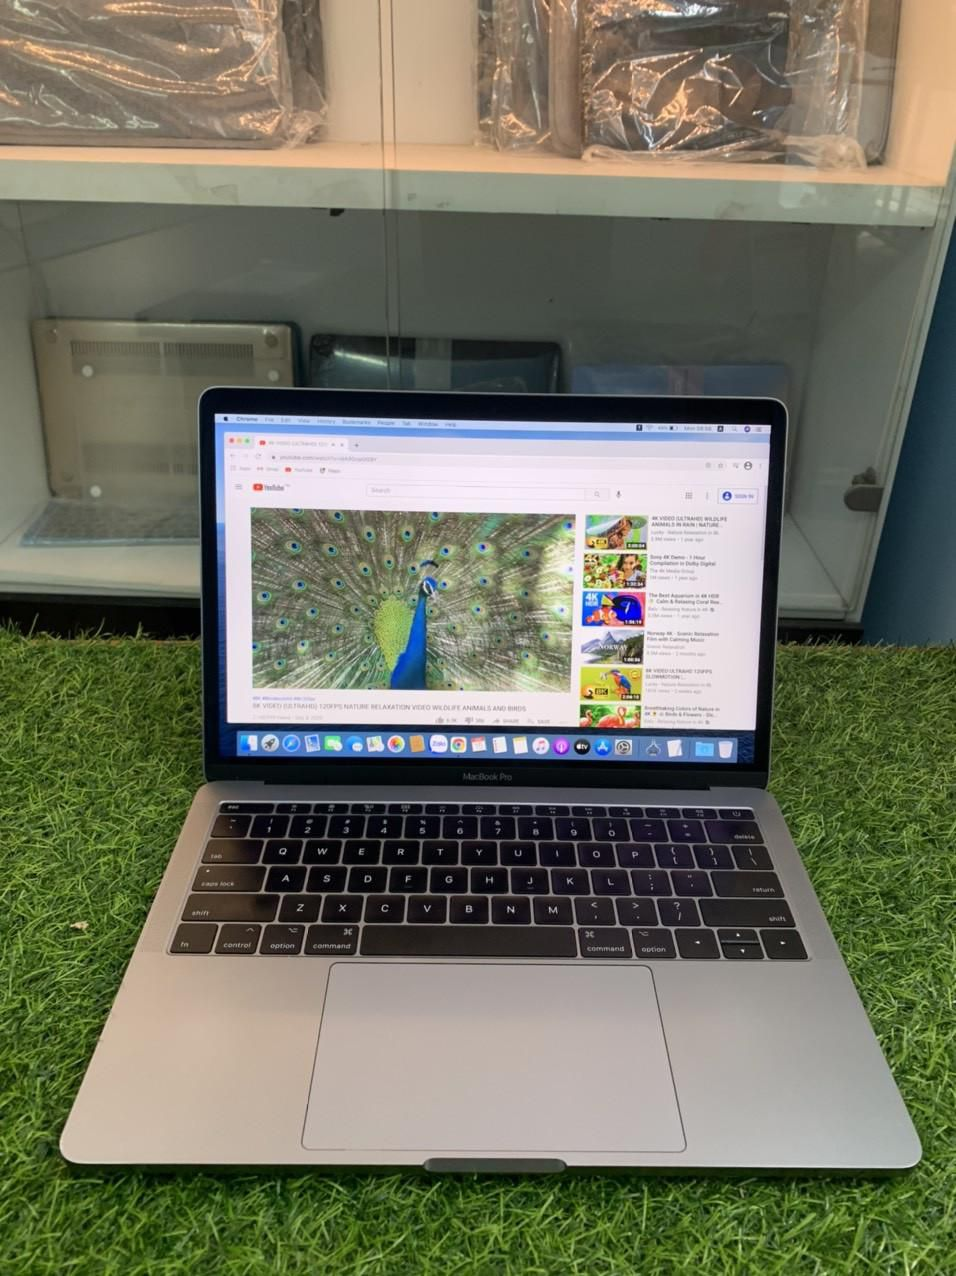 Macbook Pro 2016 13inch, Core i5/8GB/256GB